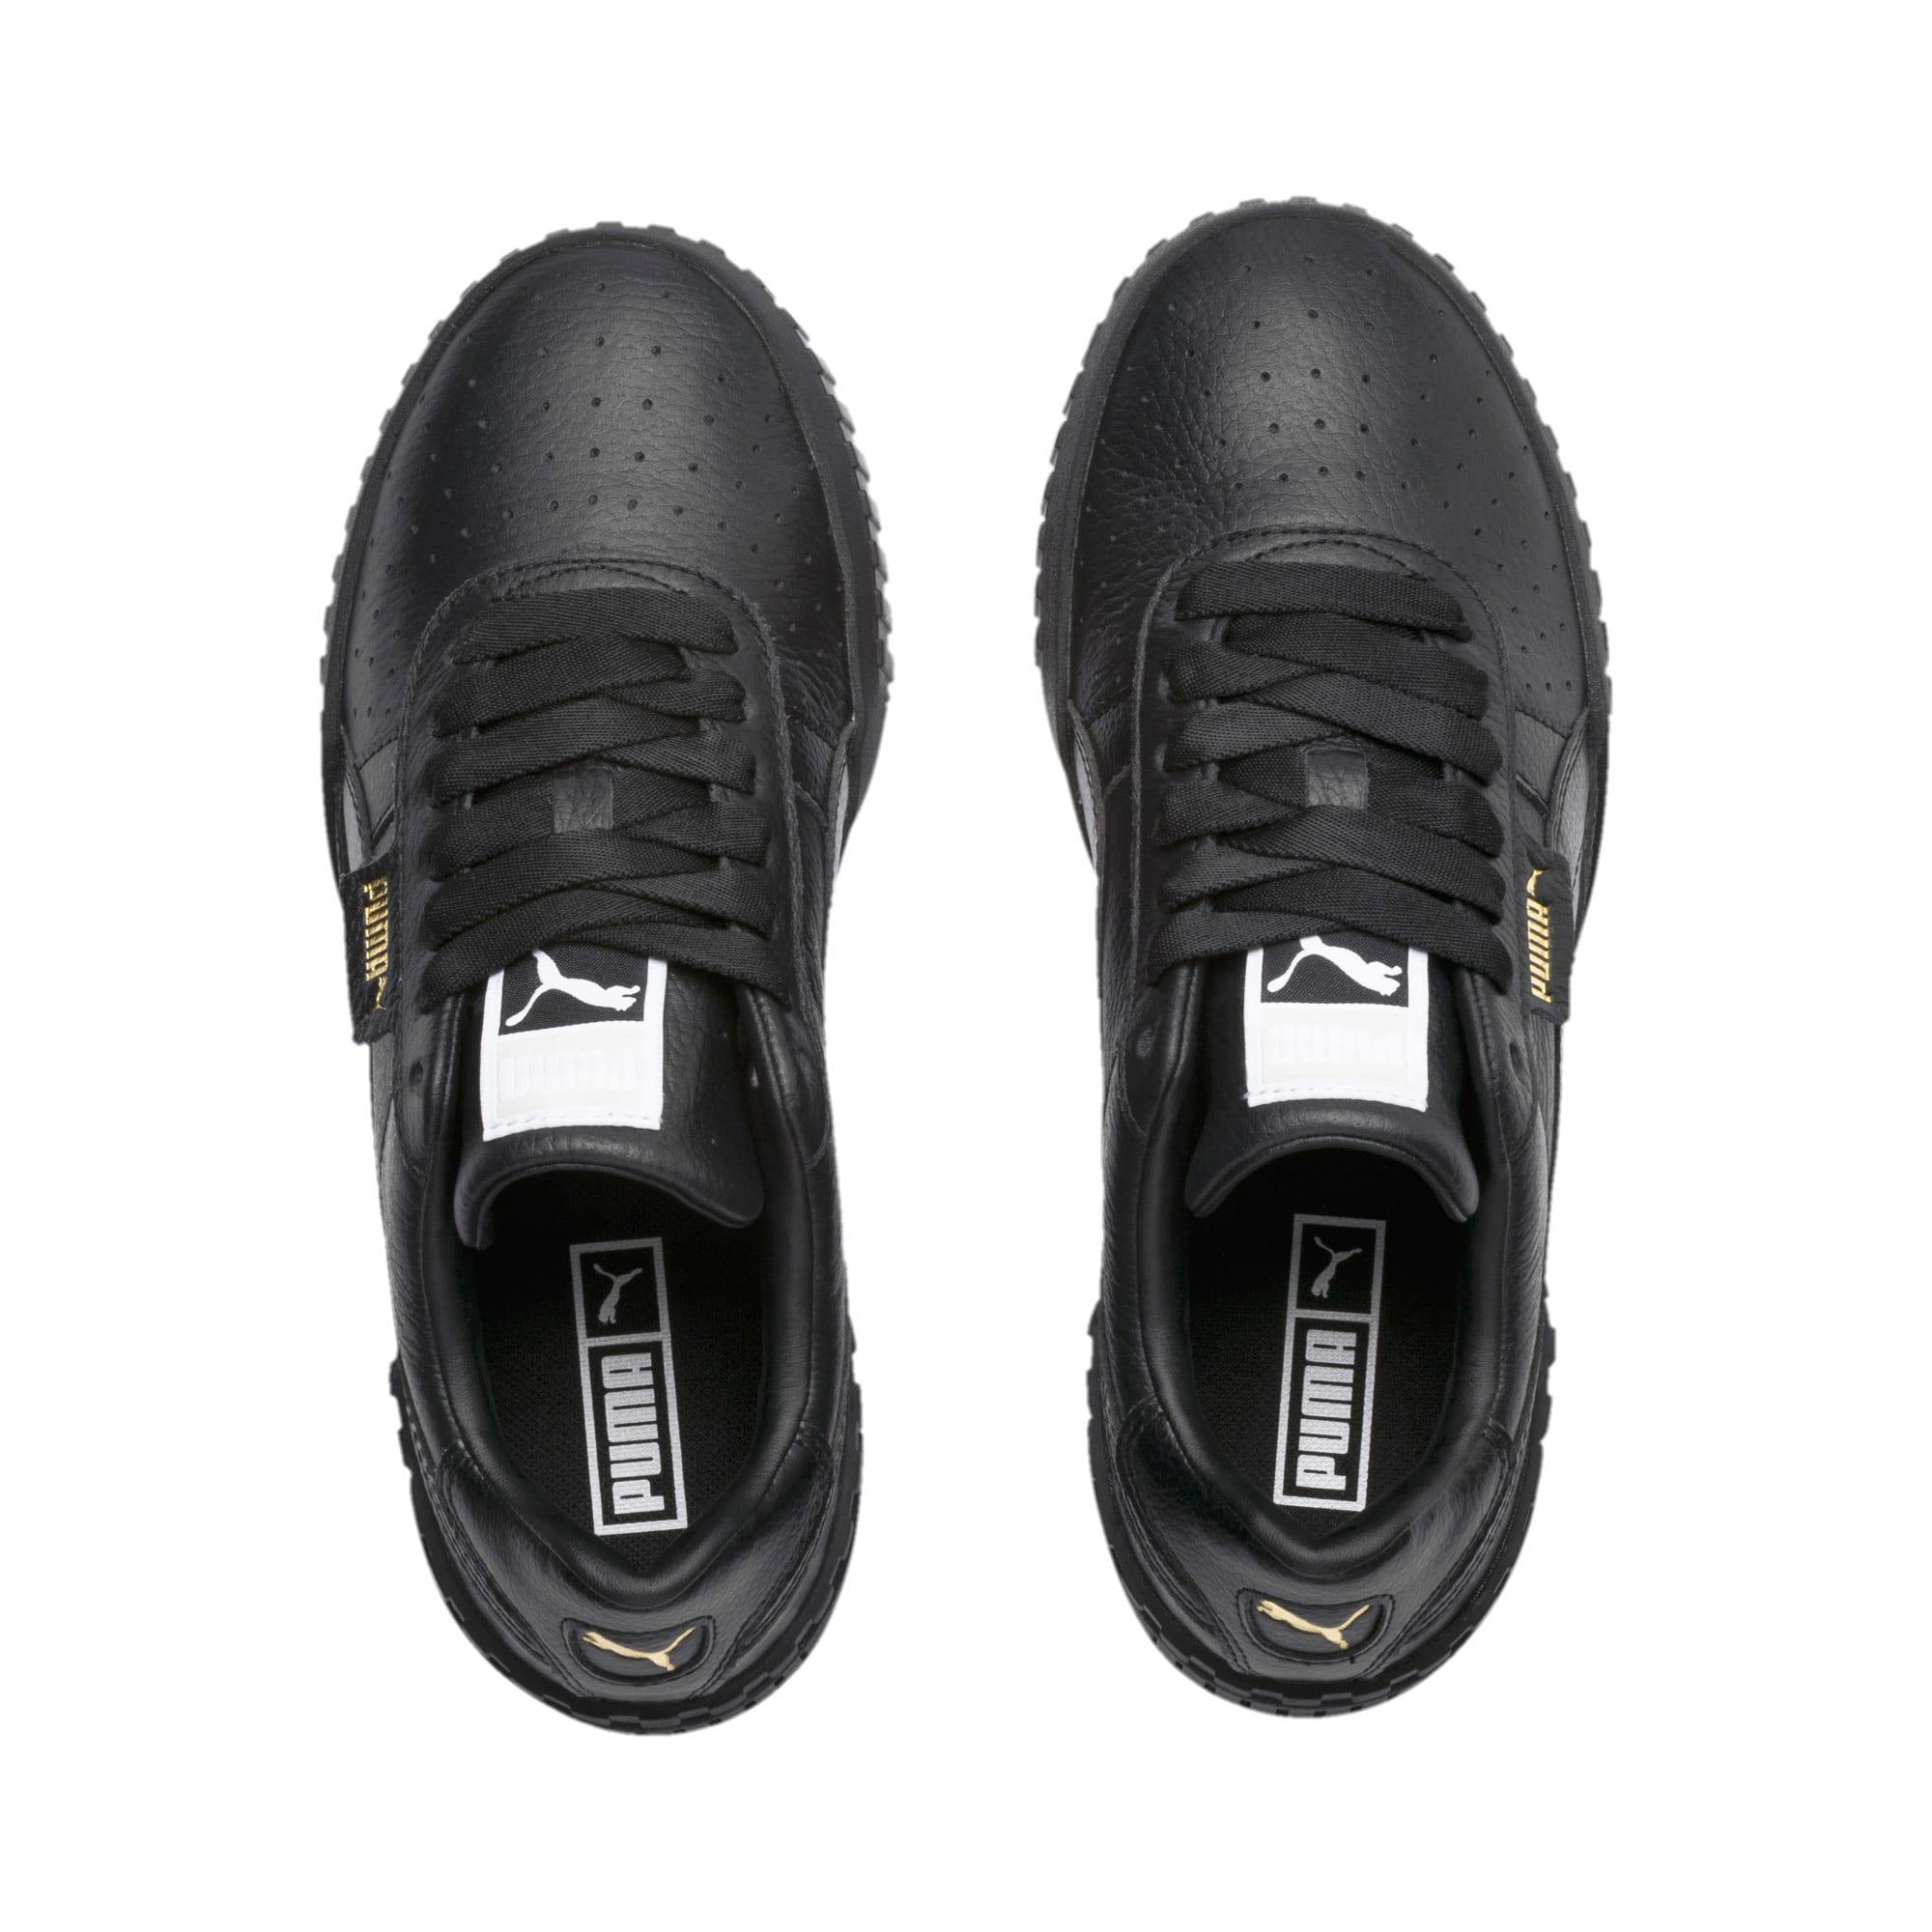 Thumbnail 7 of Sneakers Cali donna, Puma Black-Puma Black, medium